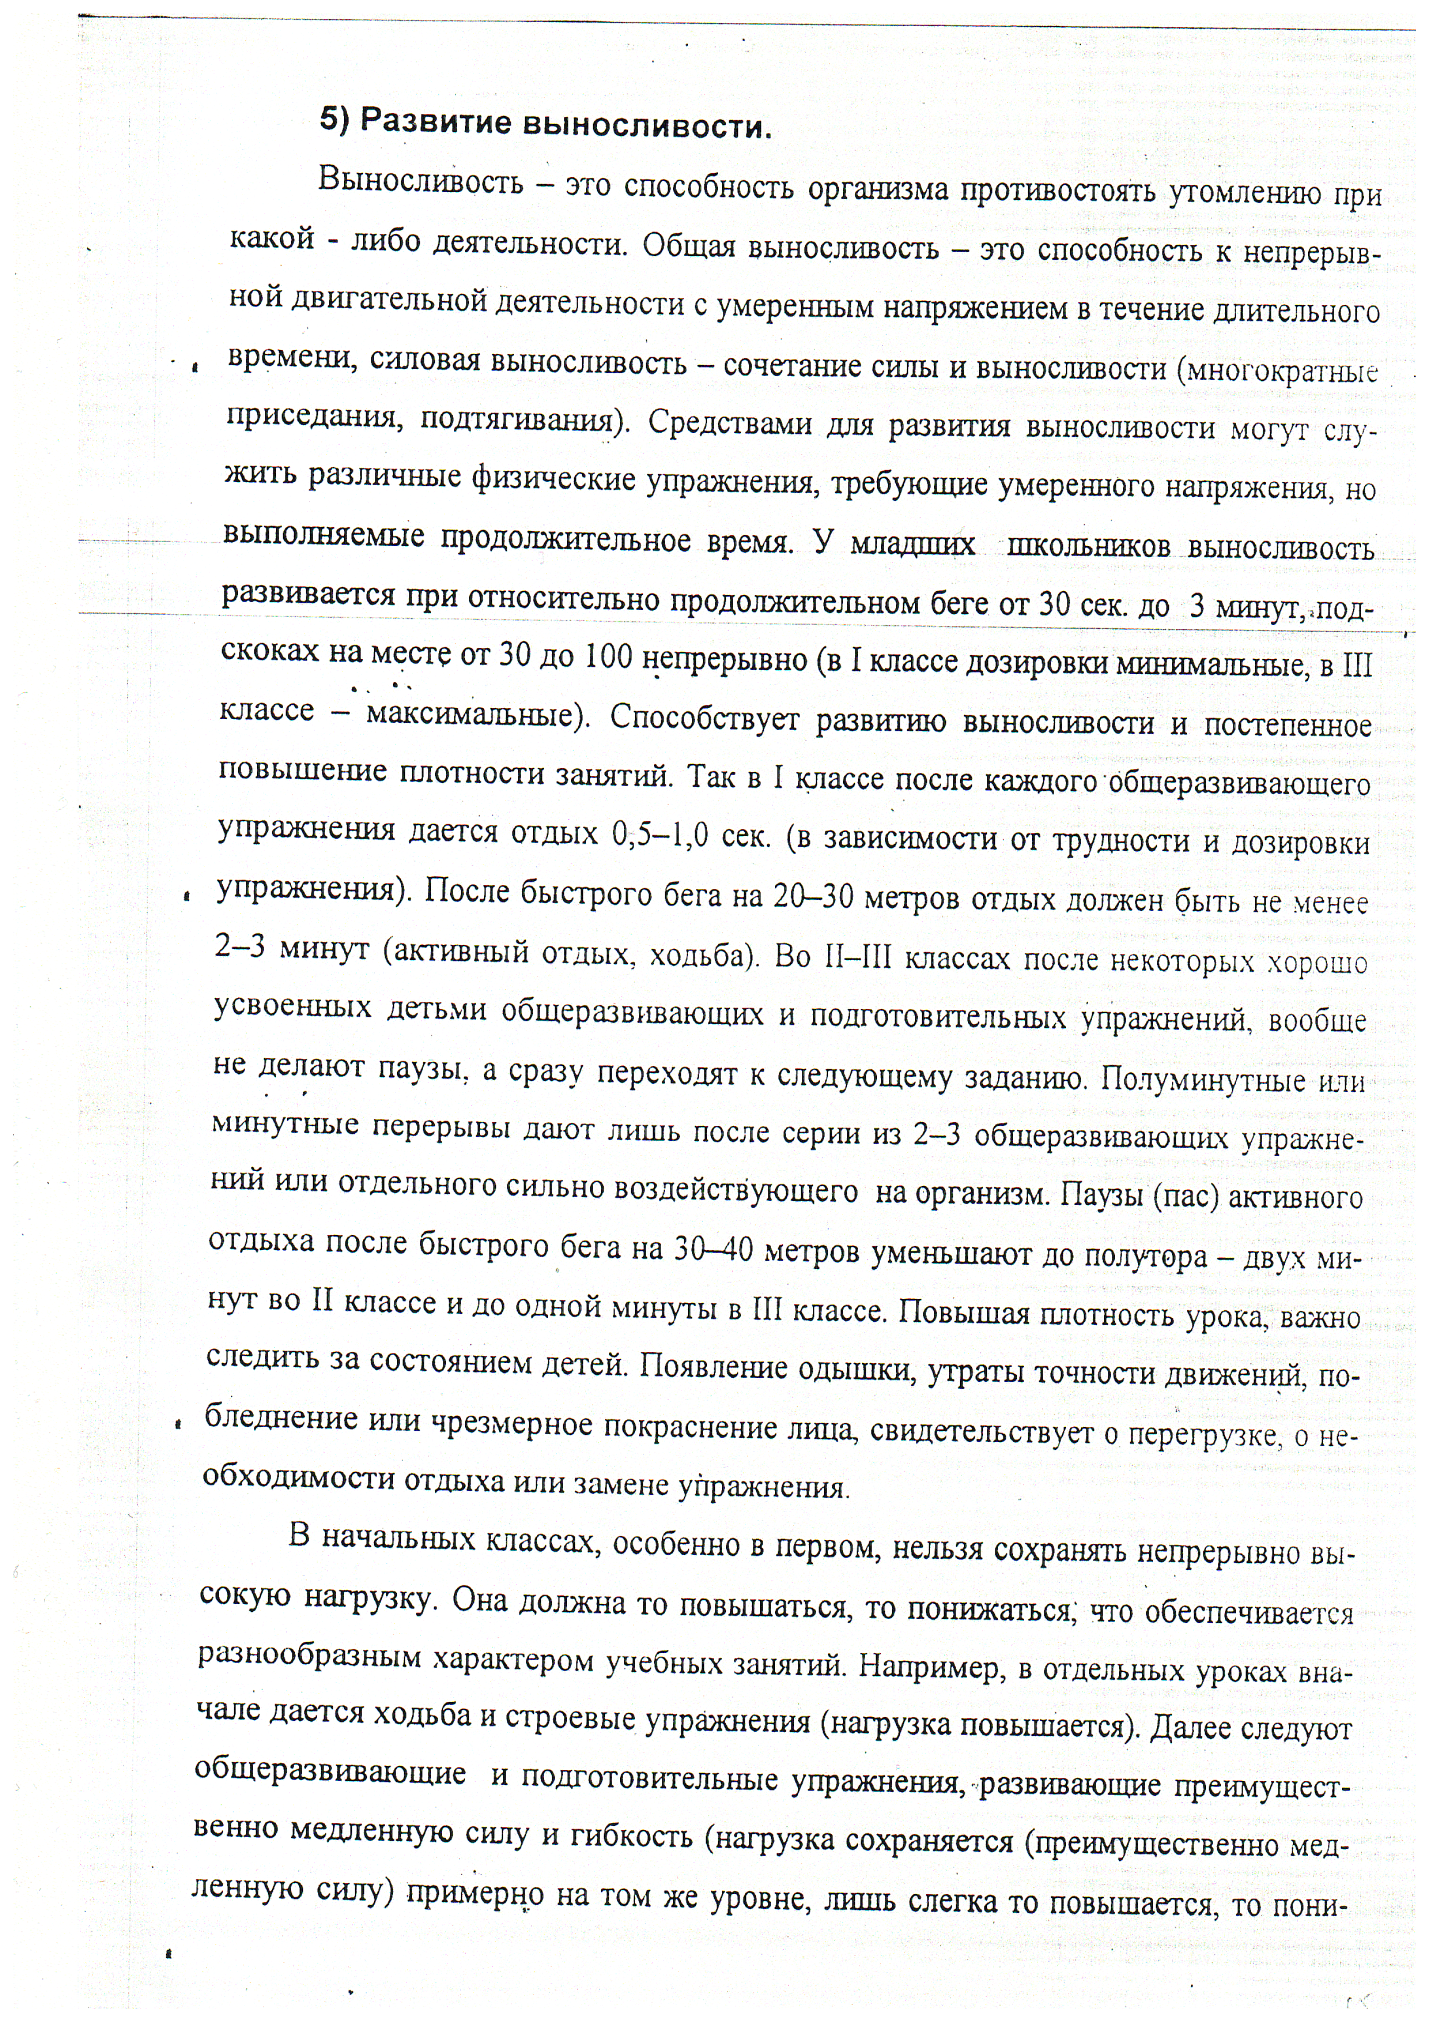 C:\Users\Татьяна\Desktop\15 001.BMP